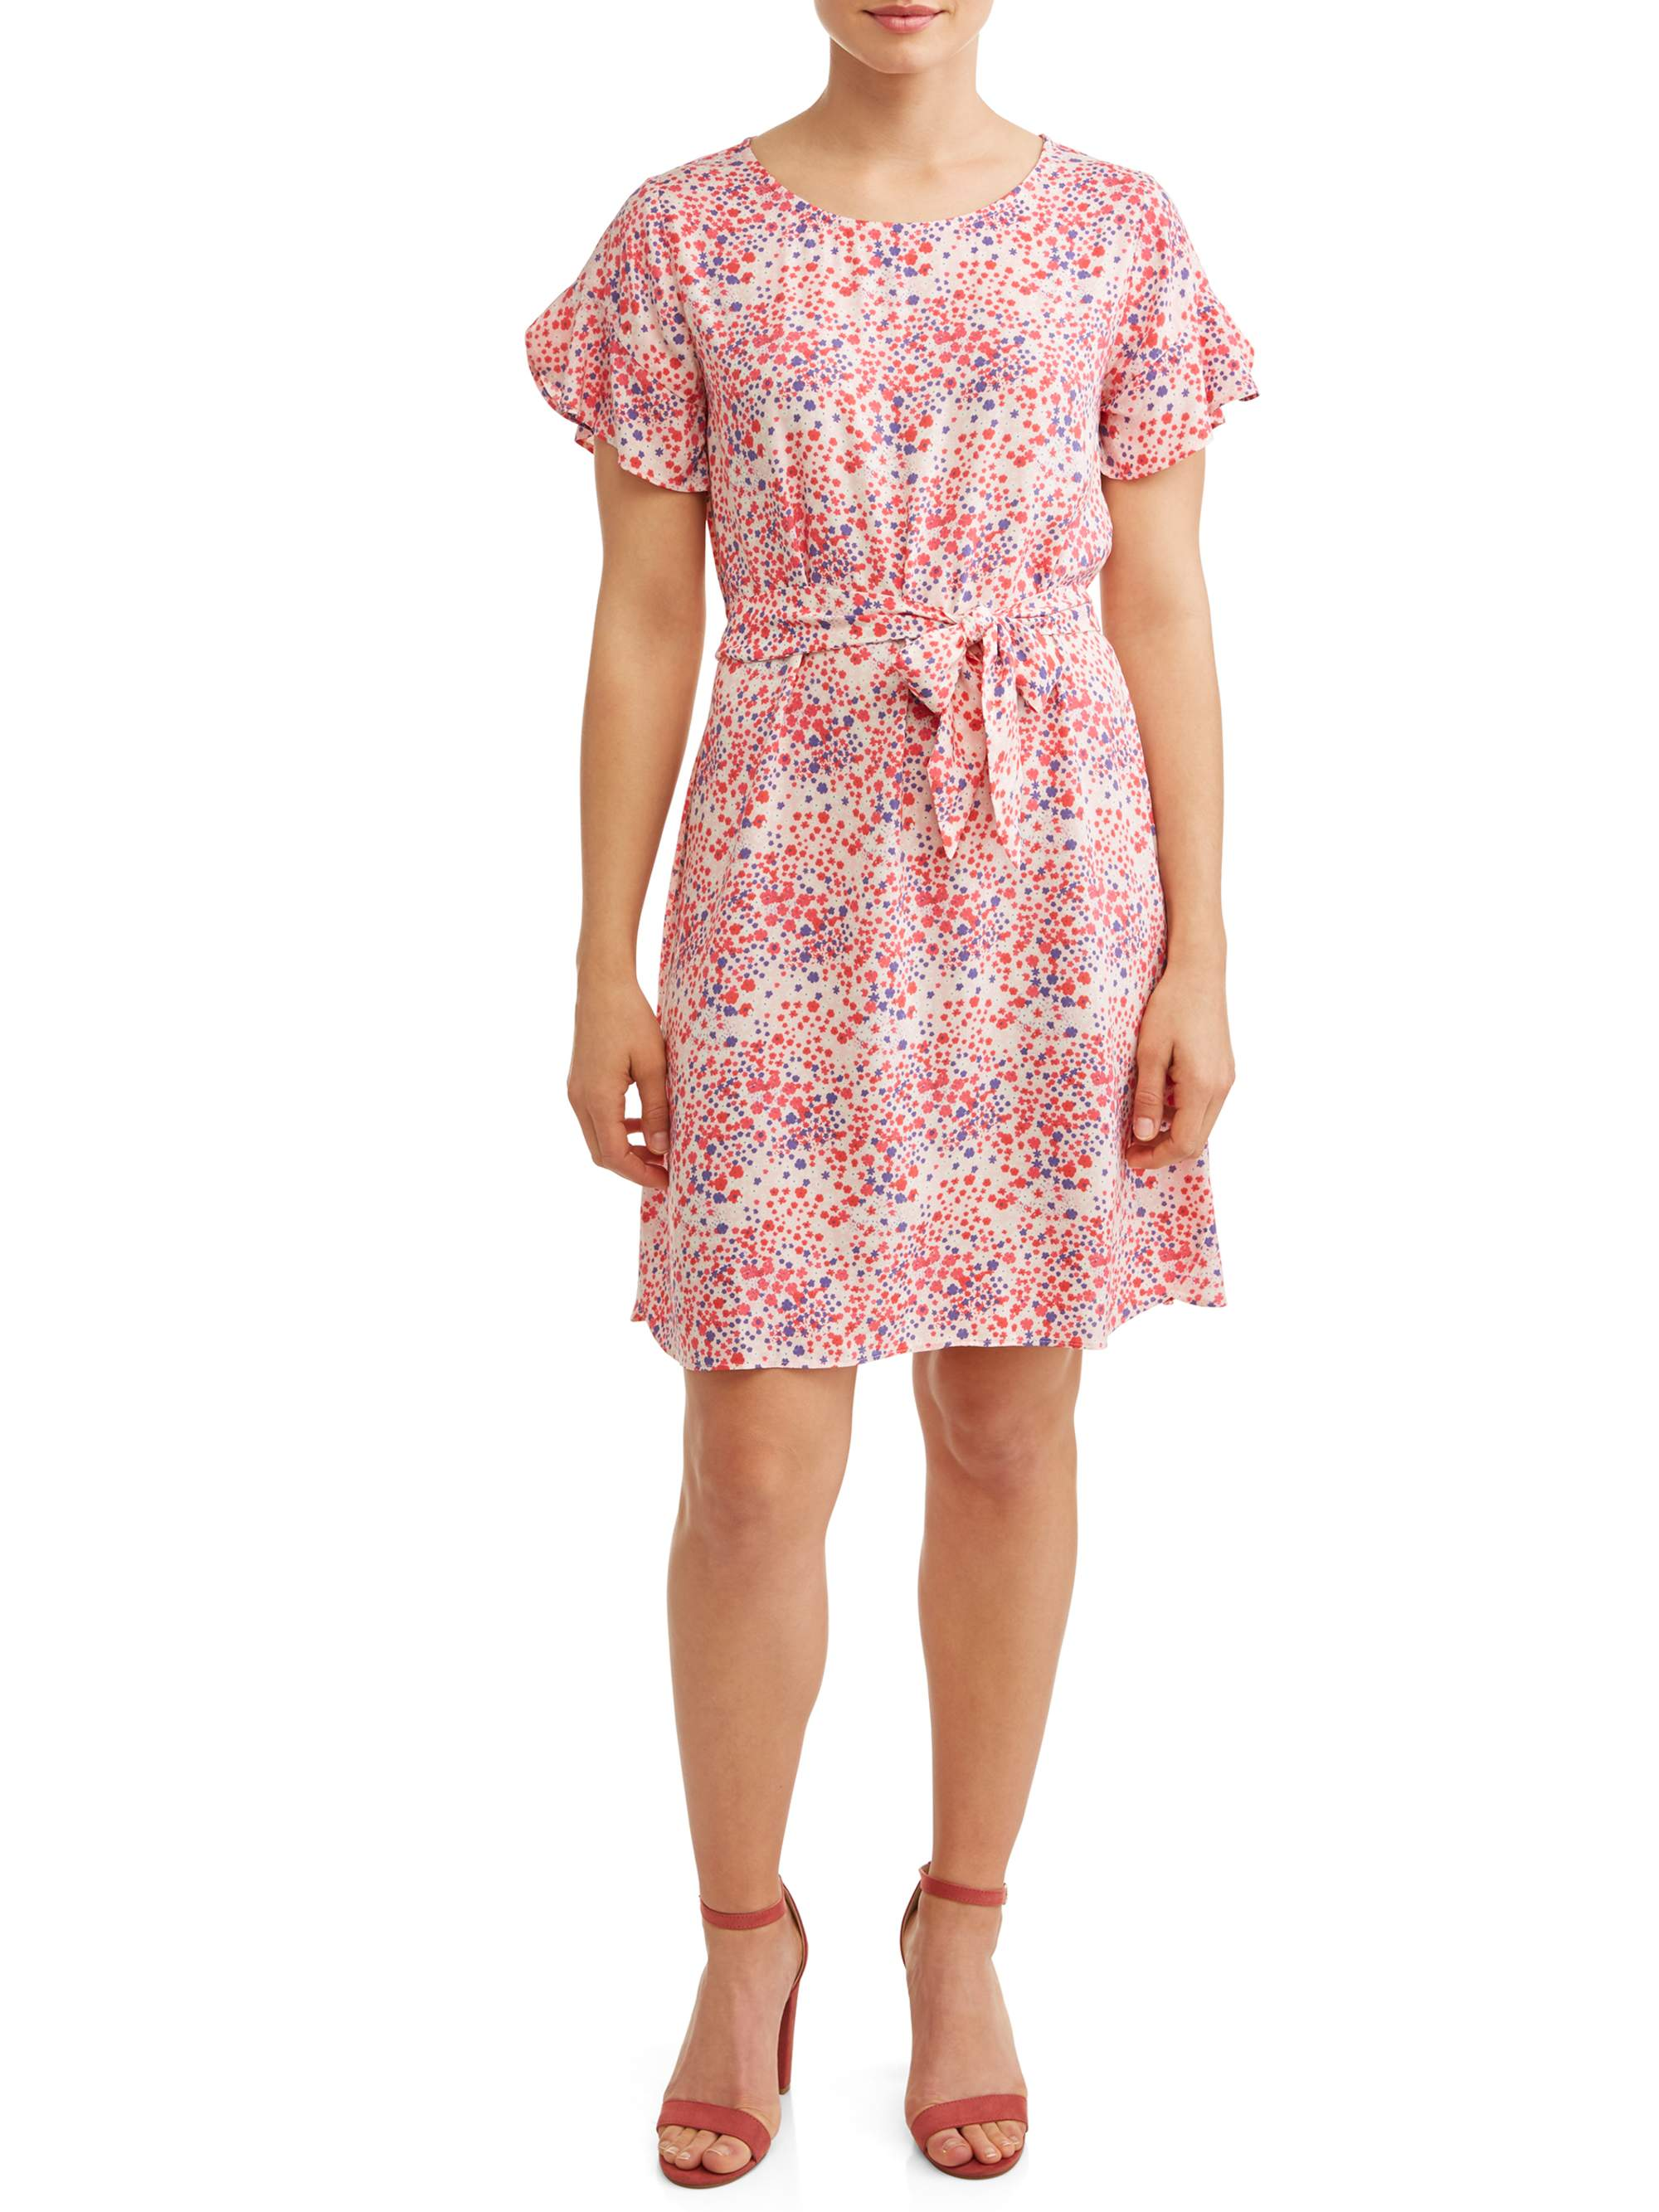 Women's Woven Printed Ruffle Sleeve Dress